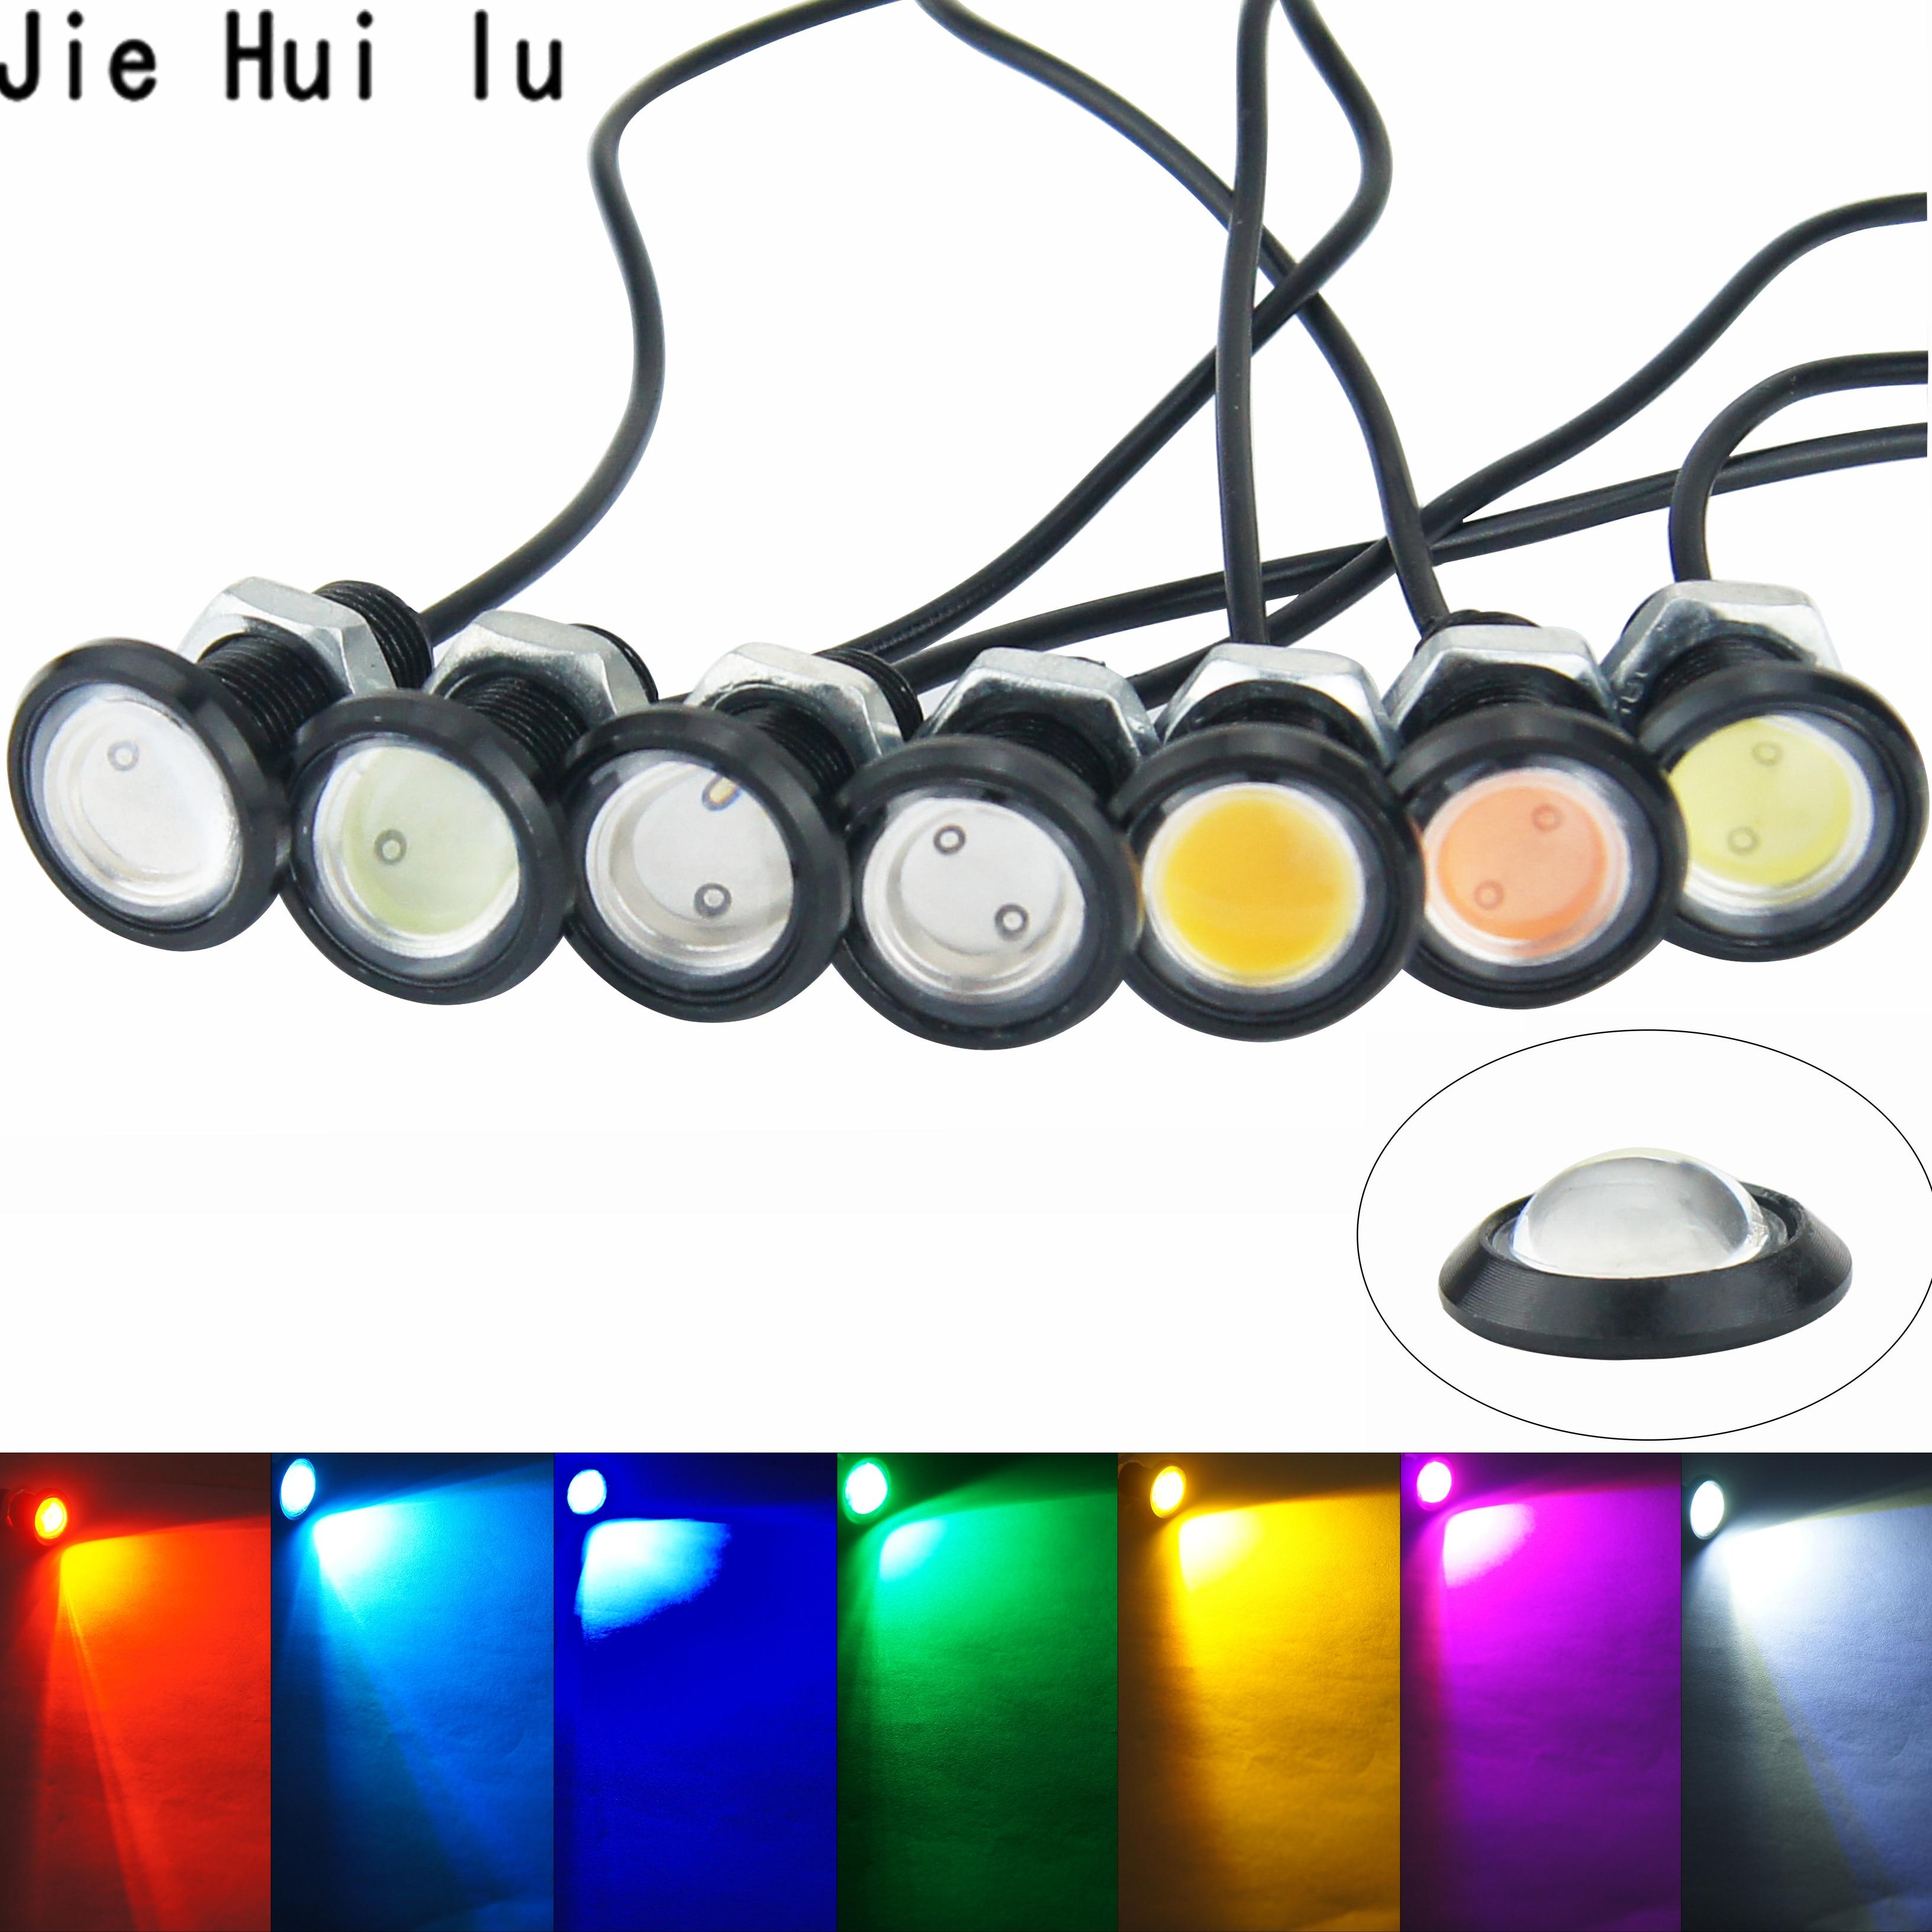 1 Uds., luz LED ojo de águila para coche, luces de circulación diurna DRL, luz de señal de aparcamiento para coche, 12v 18mm 23mm para motocicleta